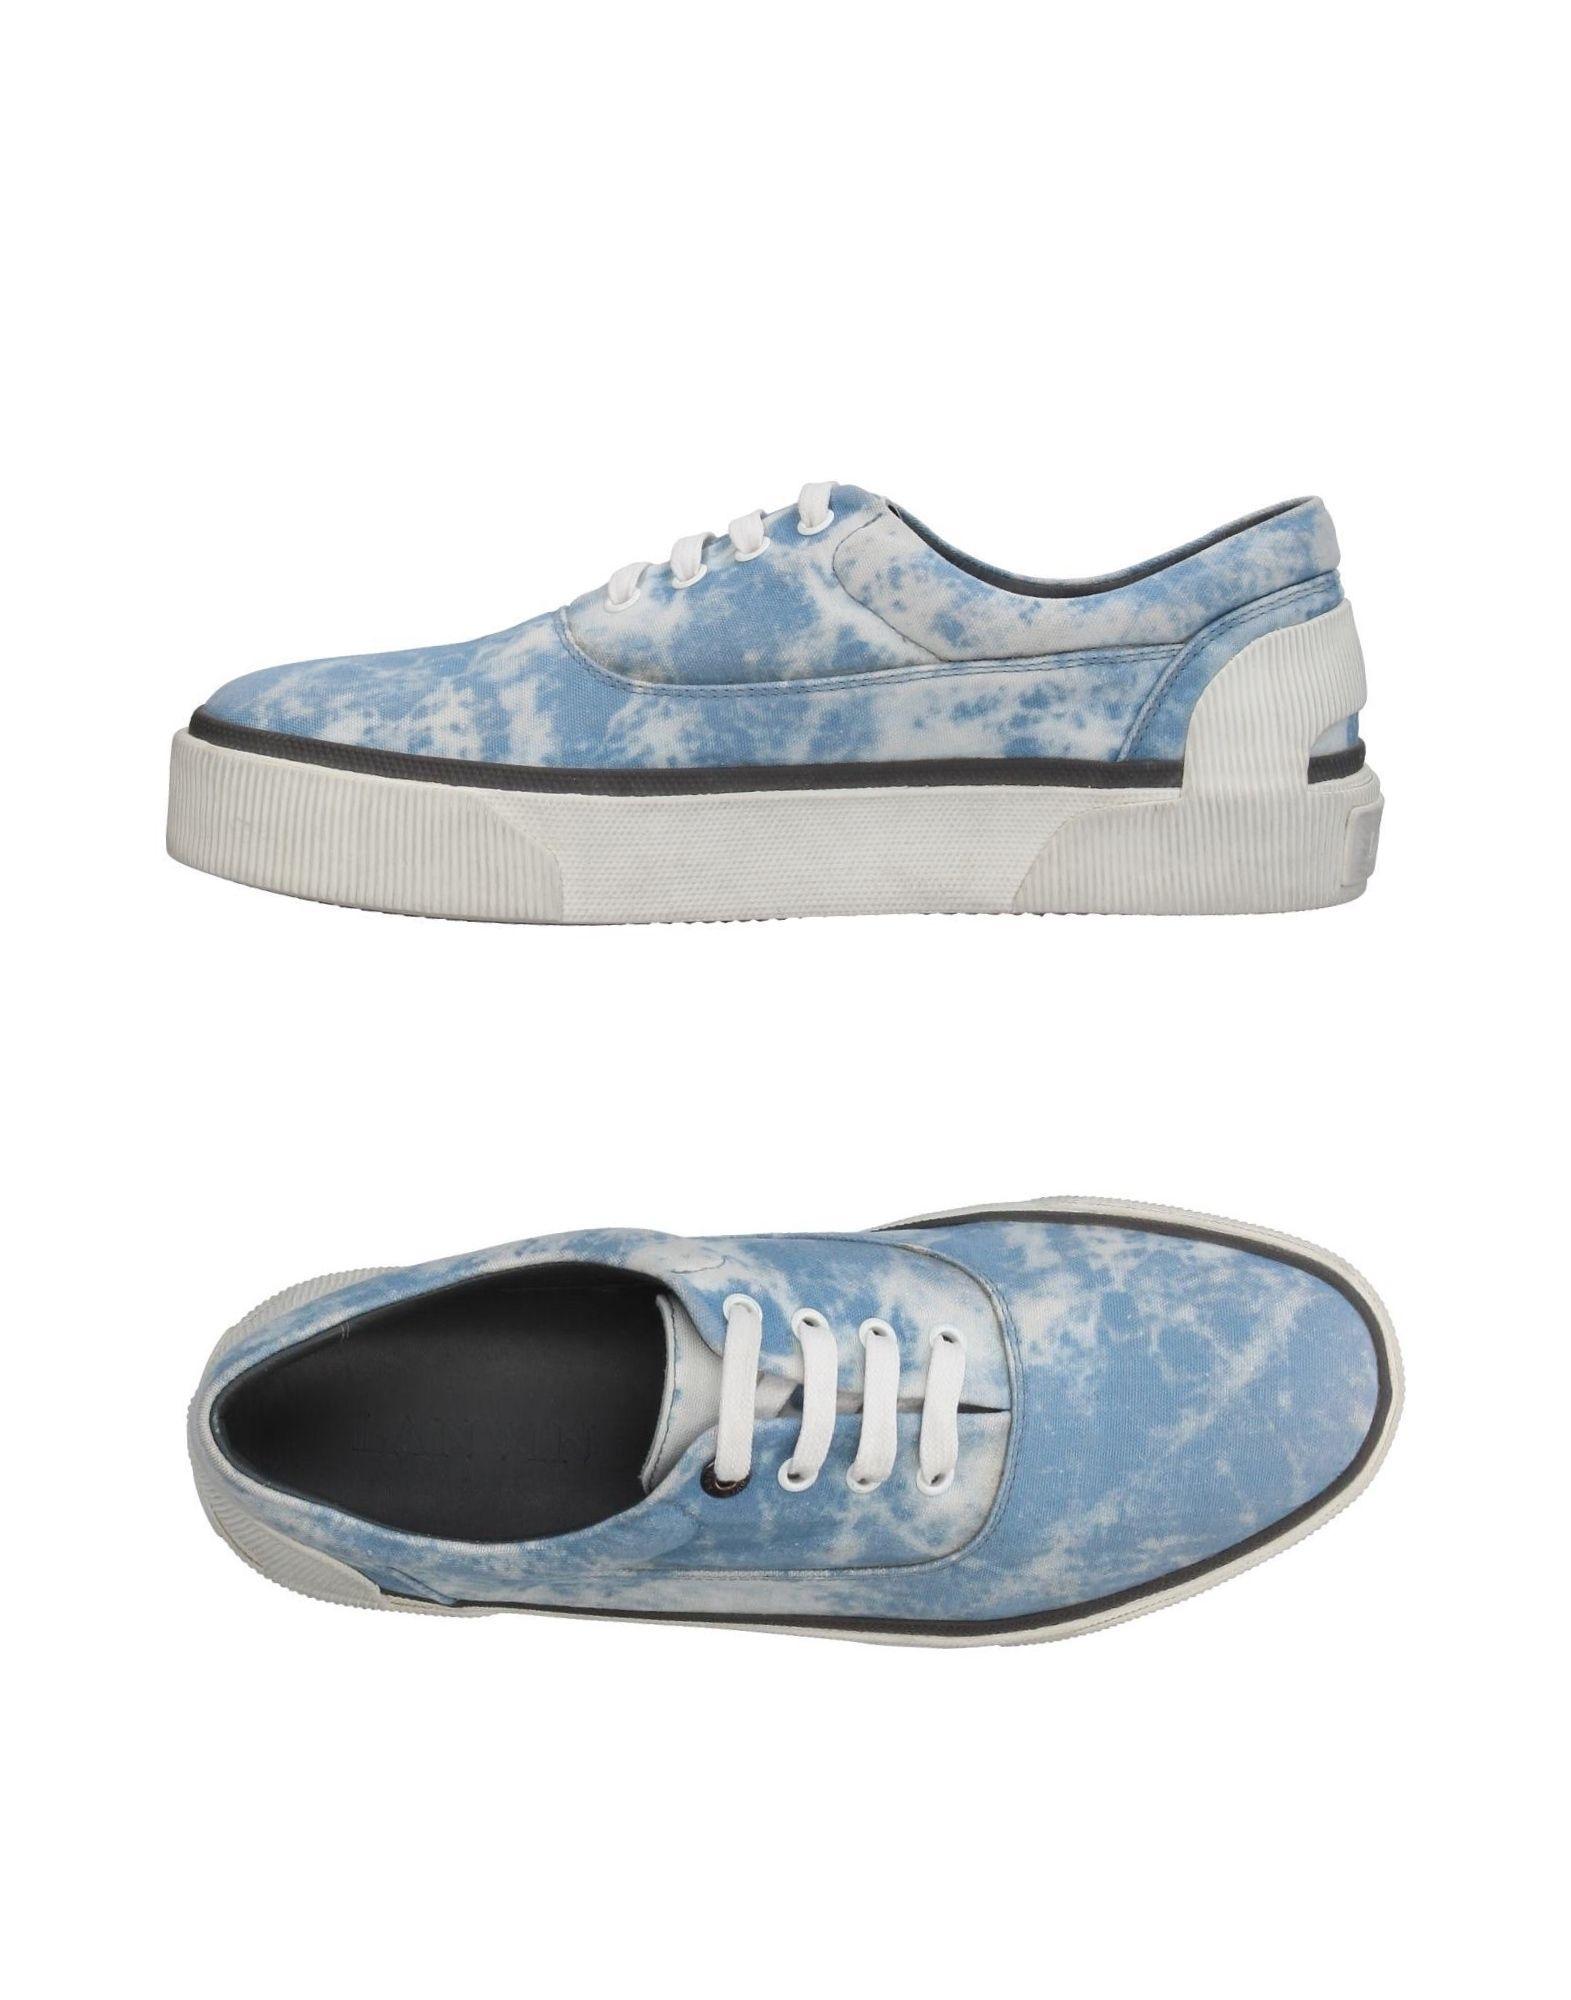 Lanvin Sneakers Herren Qualität  11405350PI Gute Qualität Herren beliebte Schuhe 0e693e